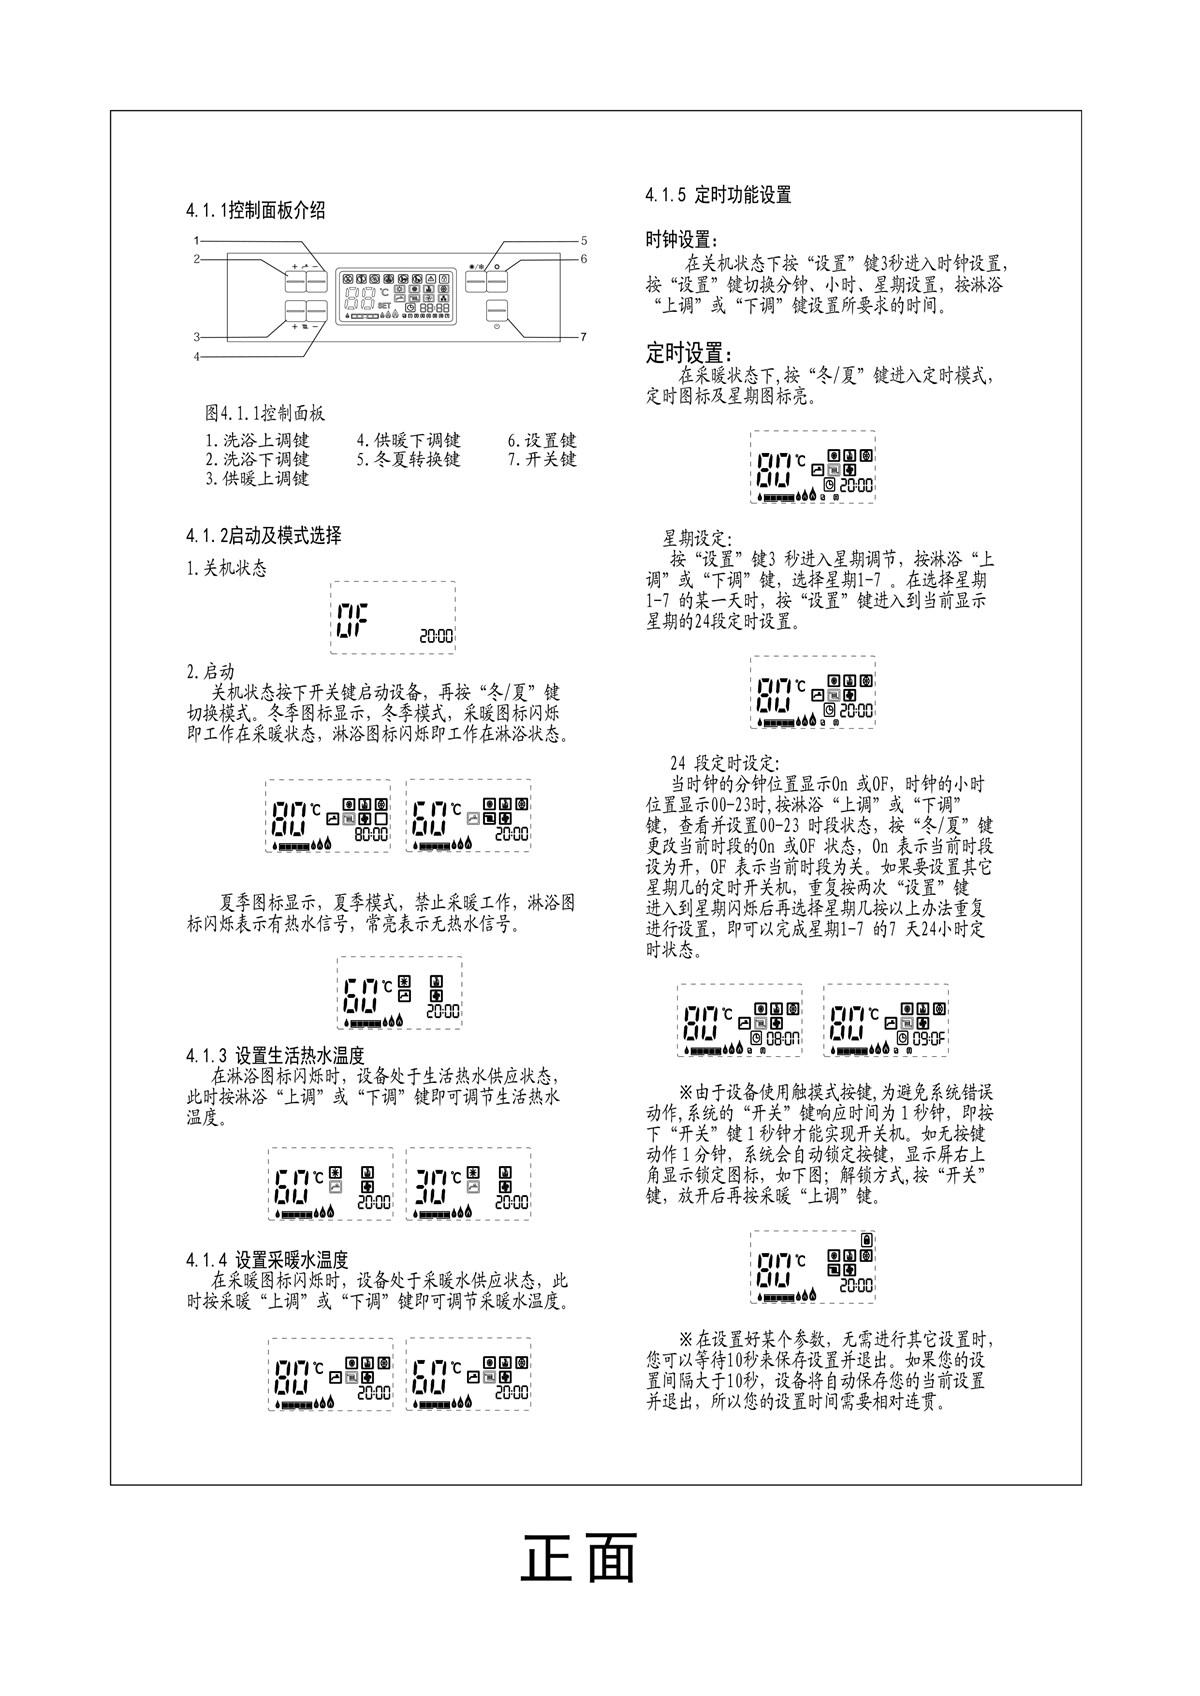 ES16A系列-用户使用手册-10_01.jpg